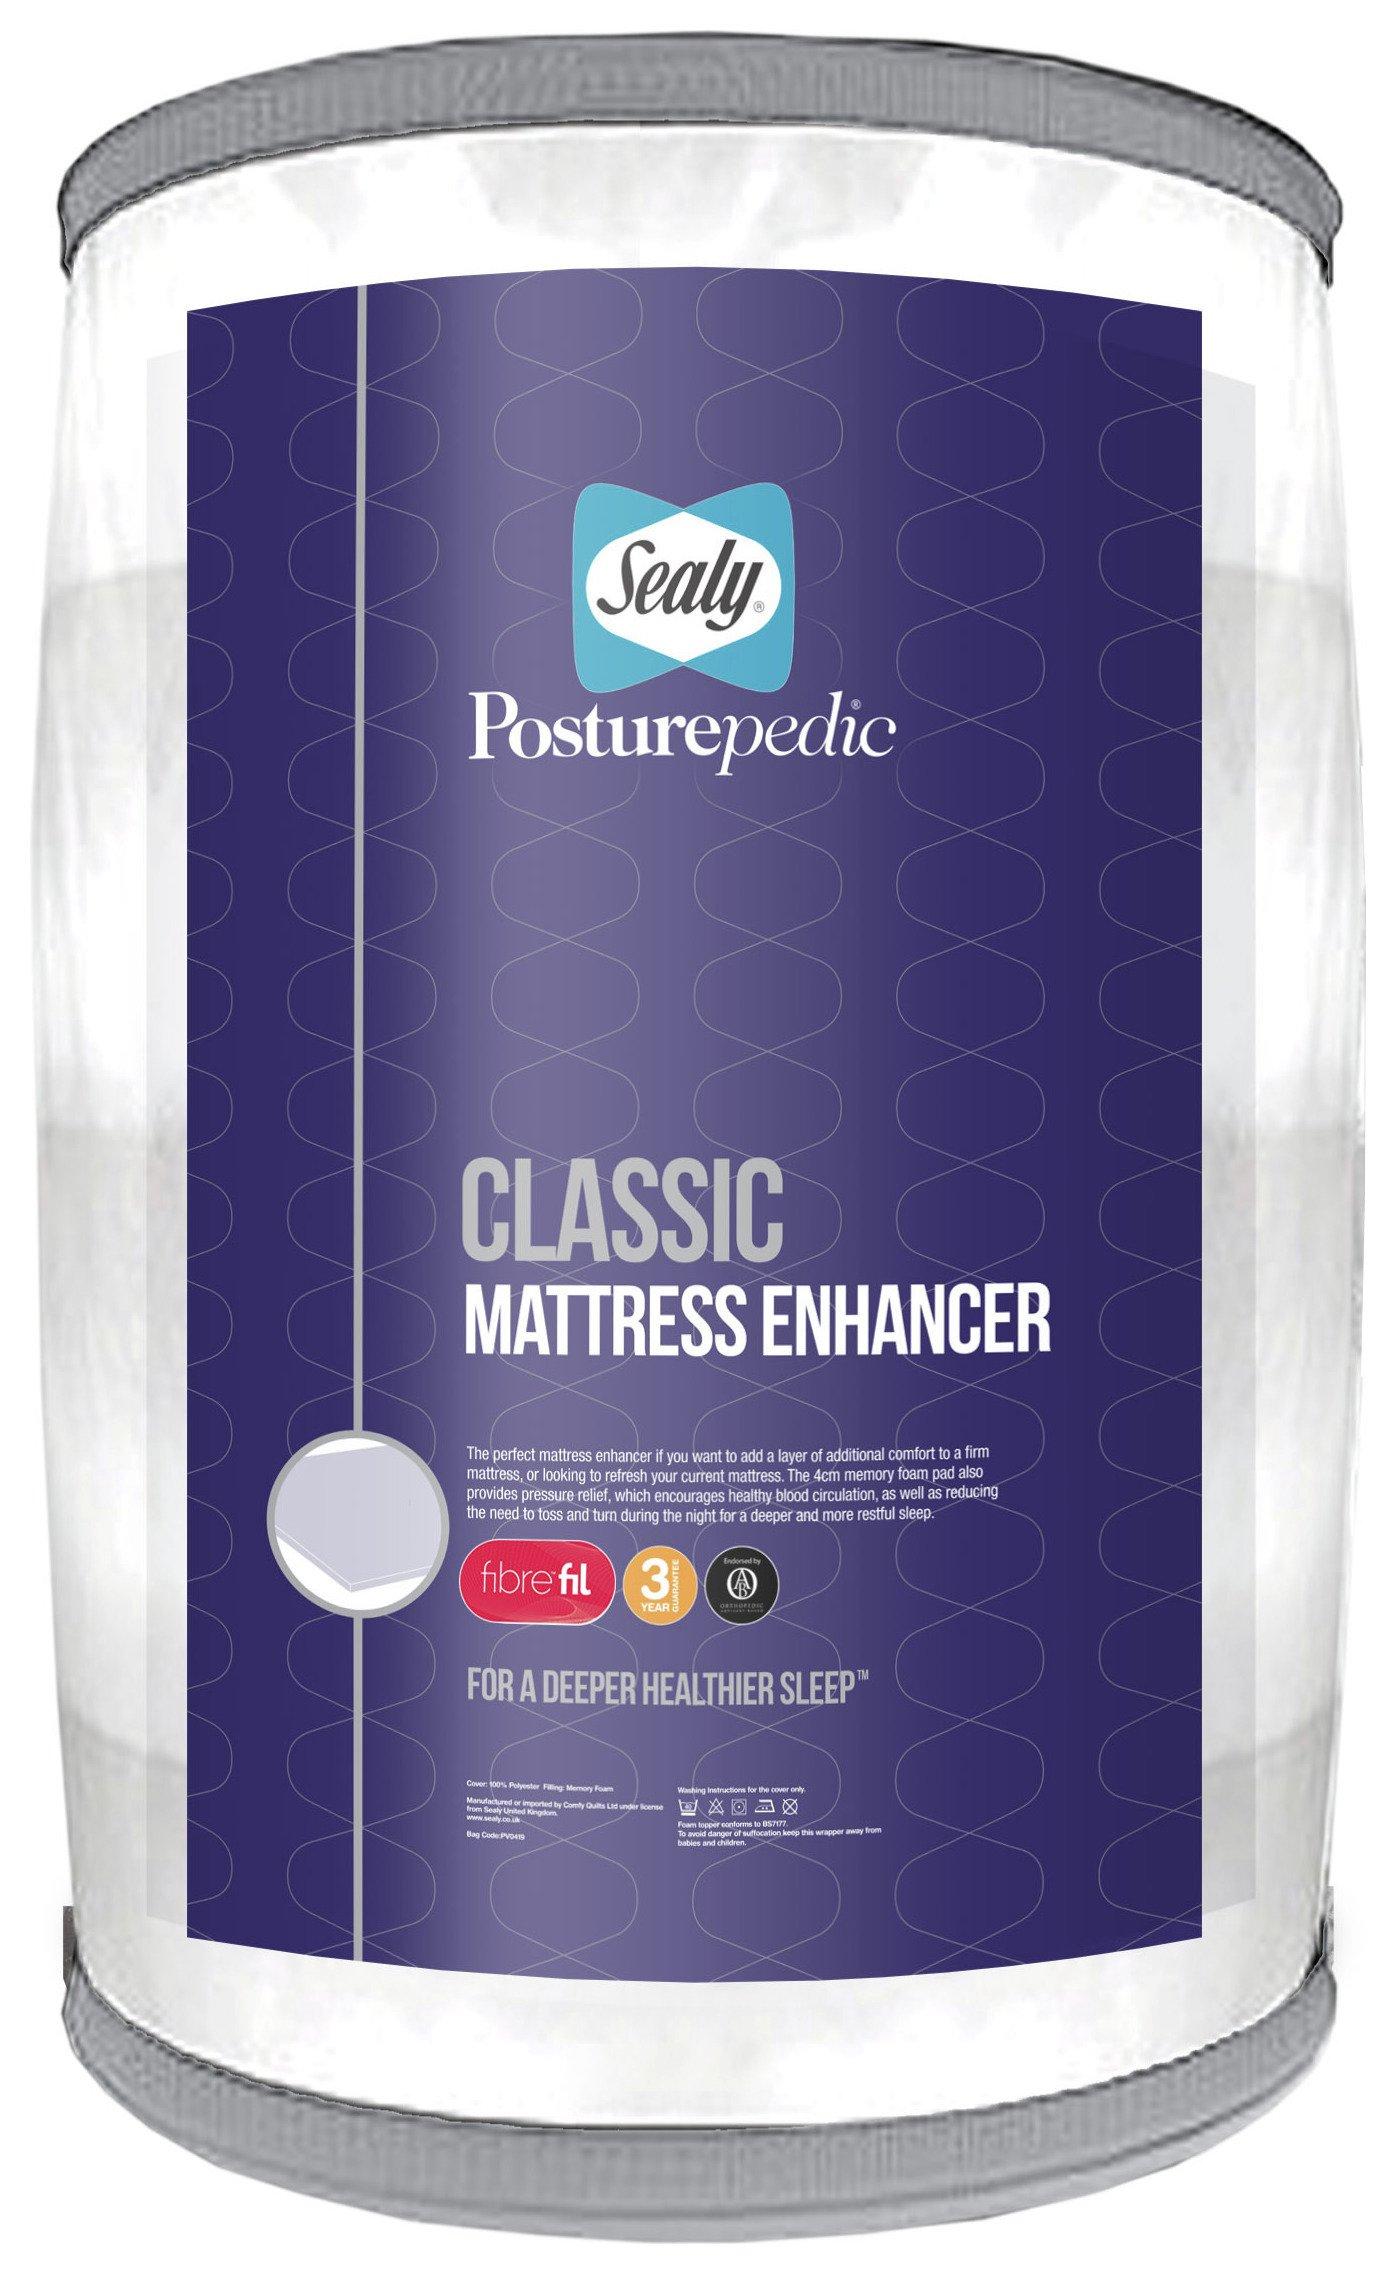 Sealy Posturepedic Classic Mattress Enhancer - Kingsize